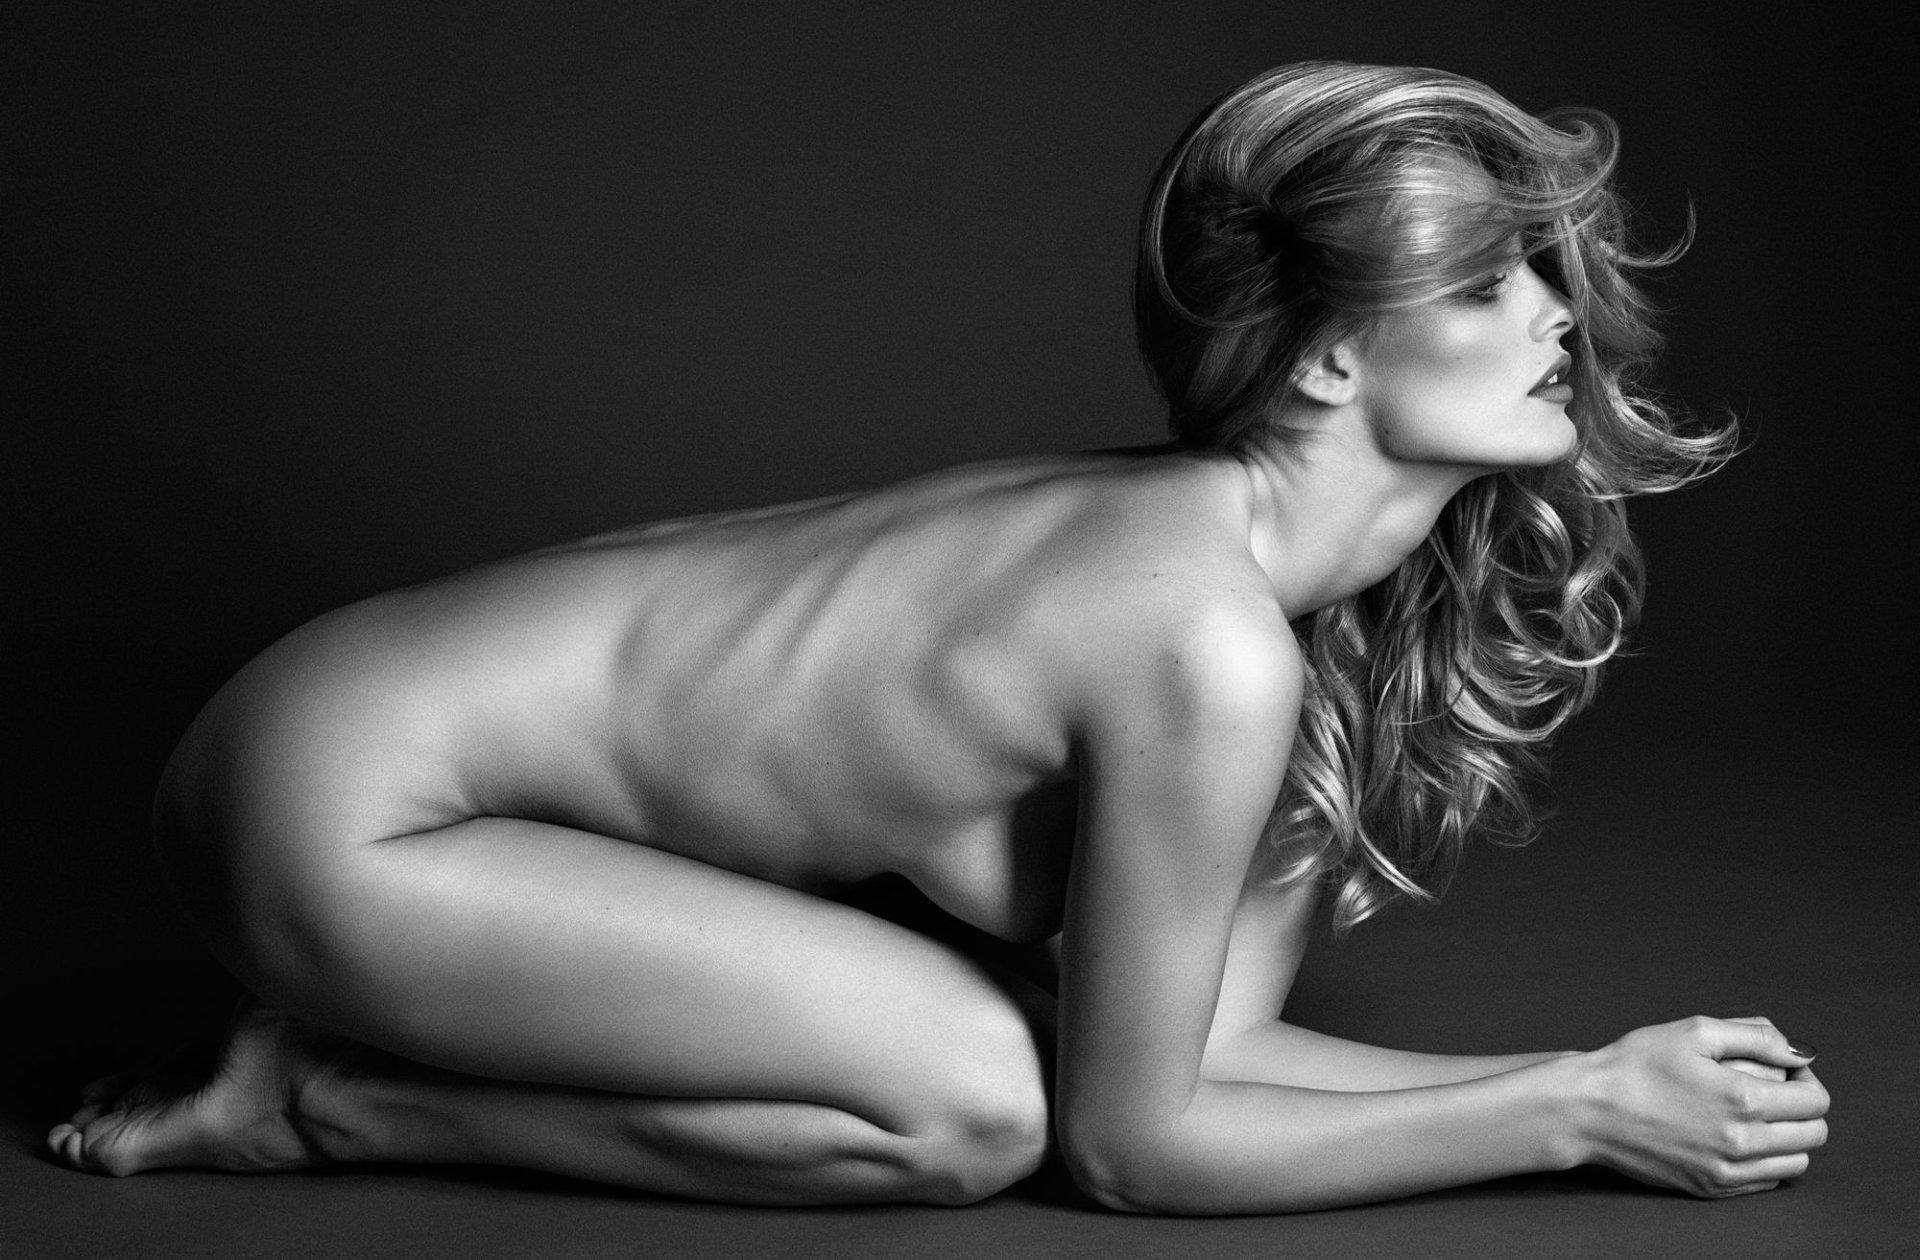 Nackt  Sabine Moussier Sabine Moussier